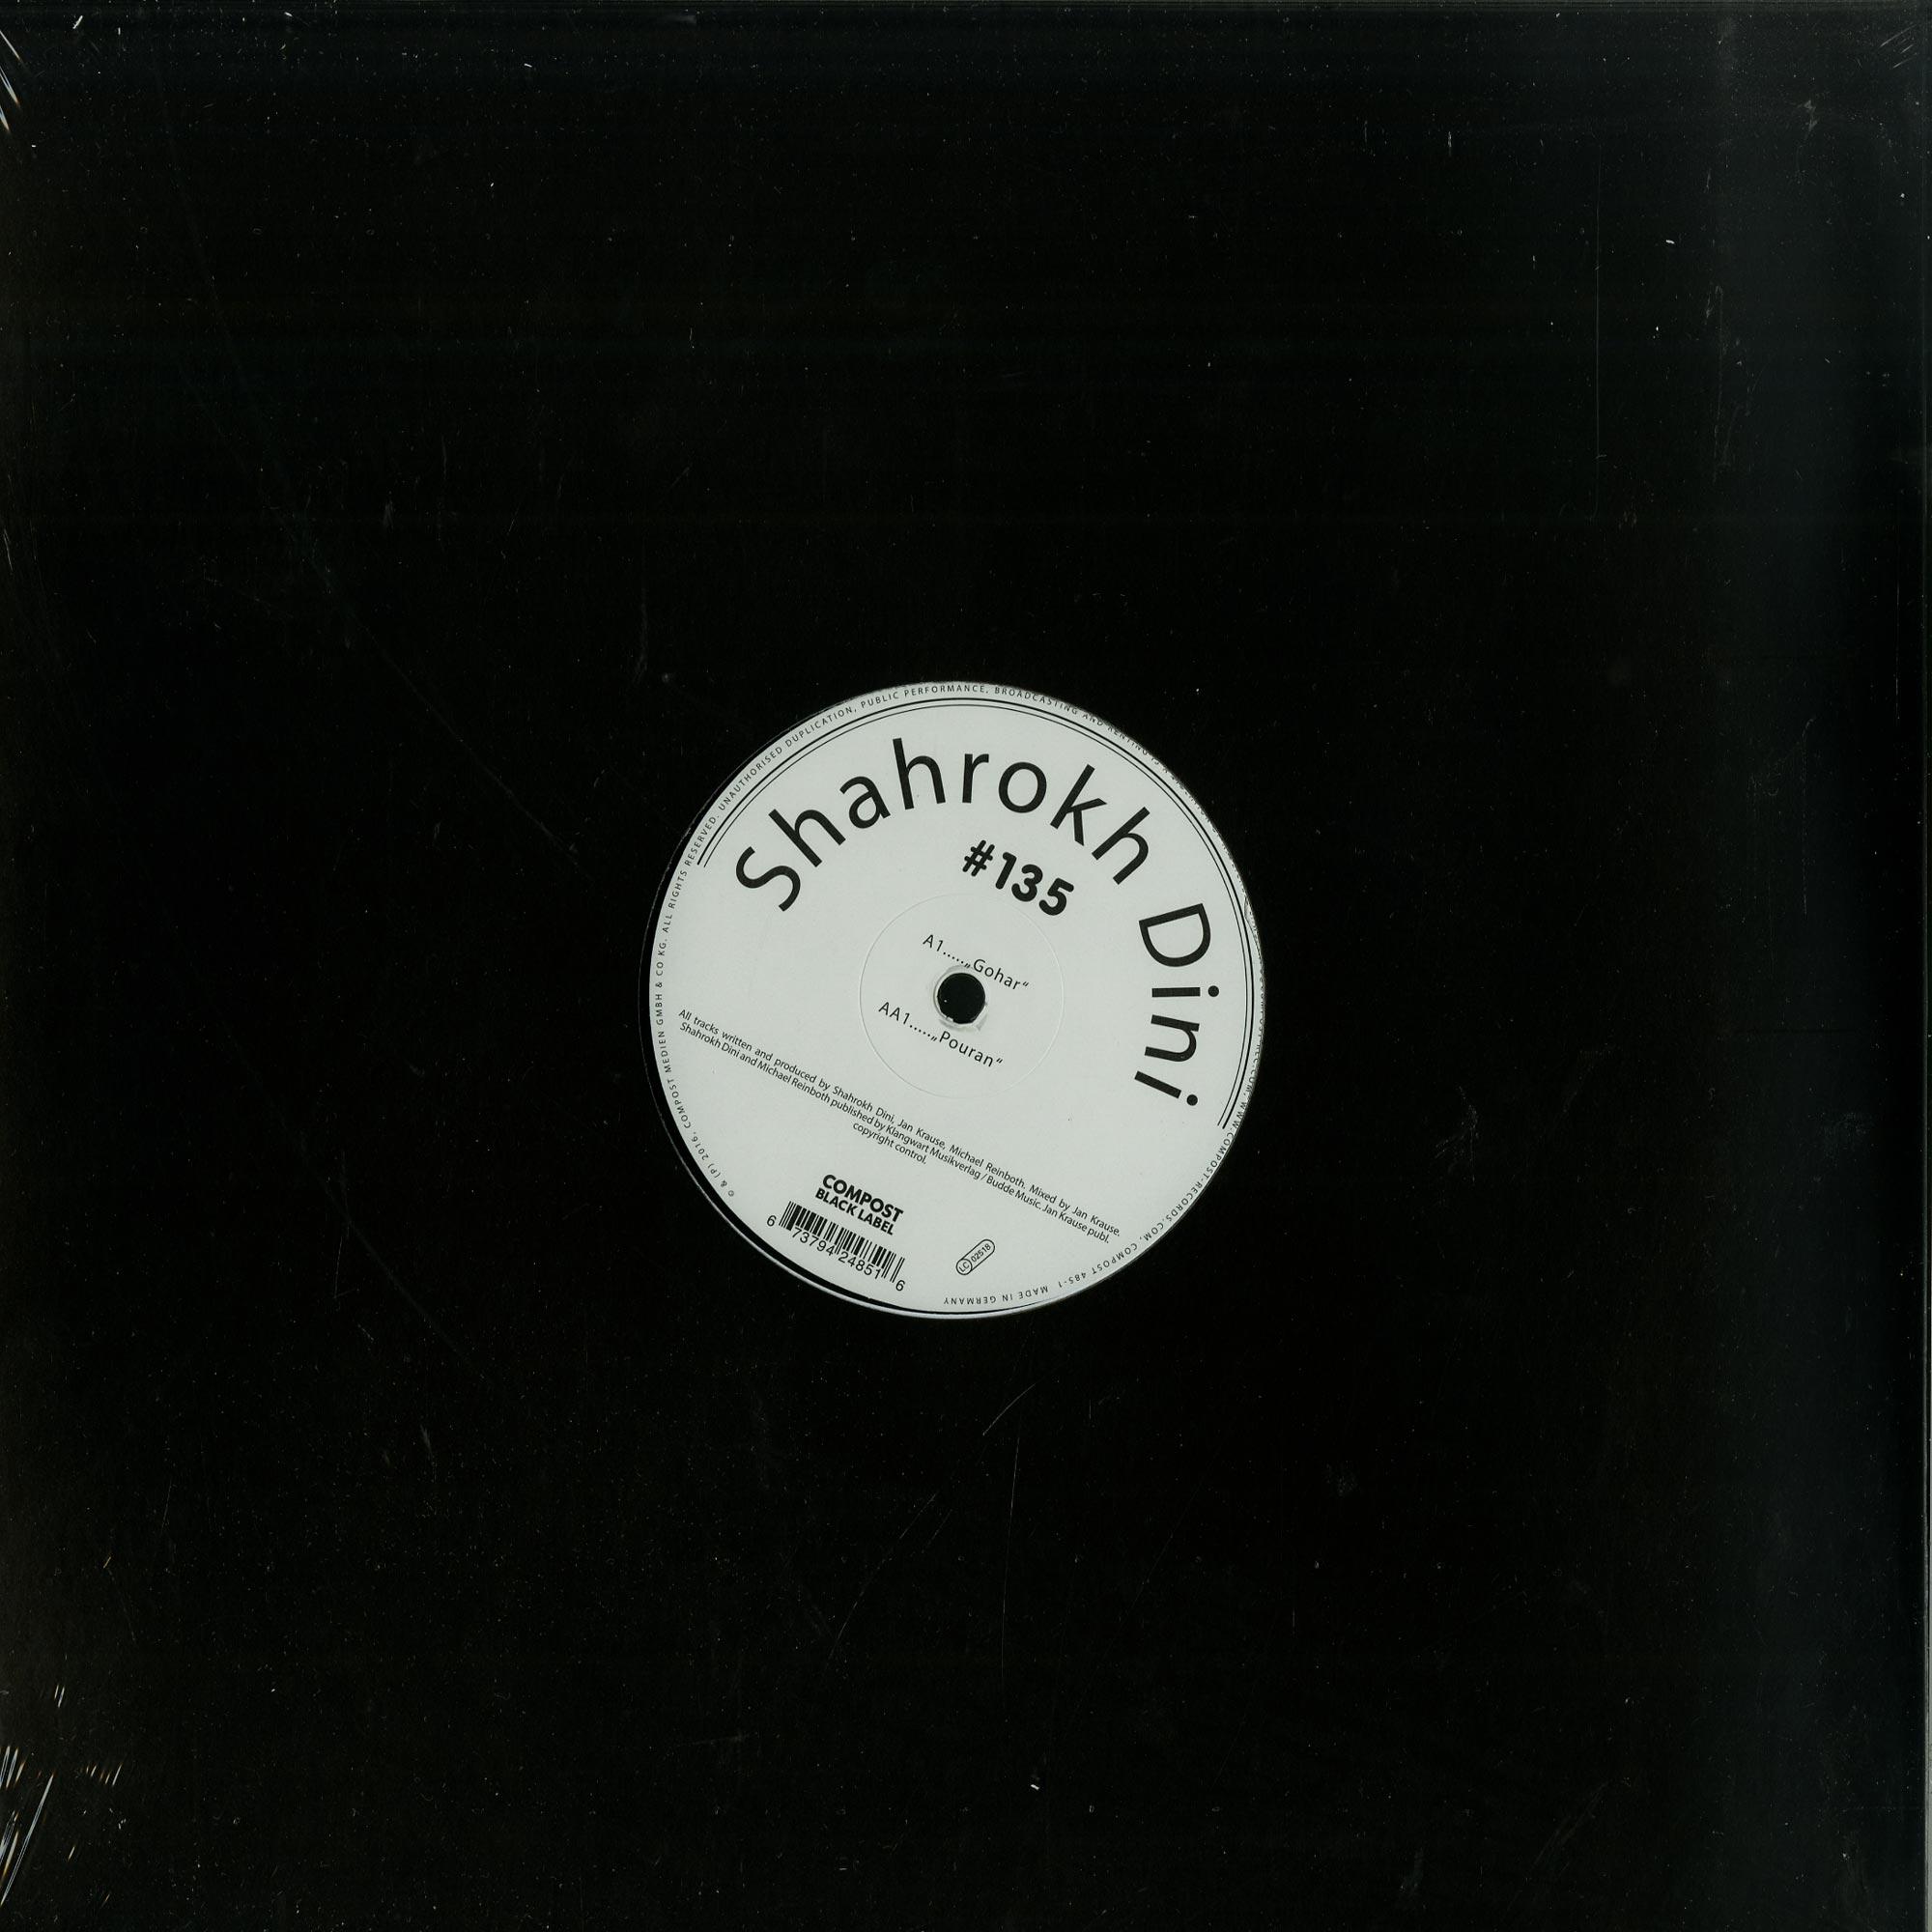 Shahrokh Dini - COMPOST BLACK LABEL 135